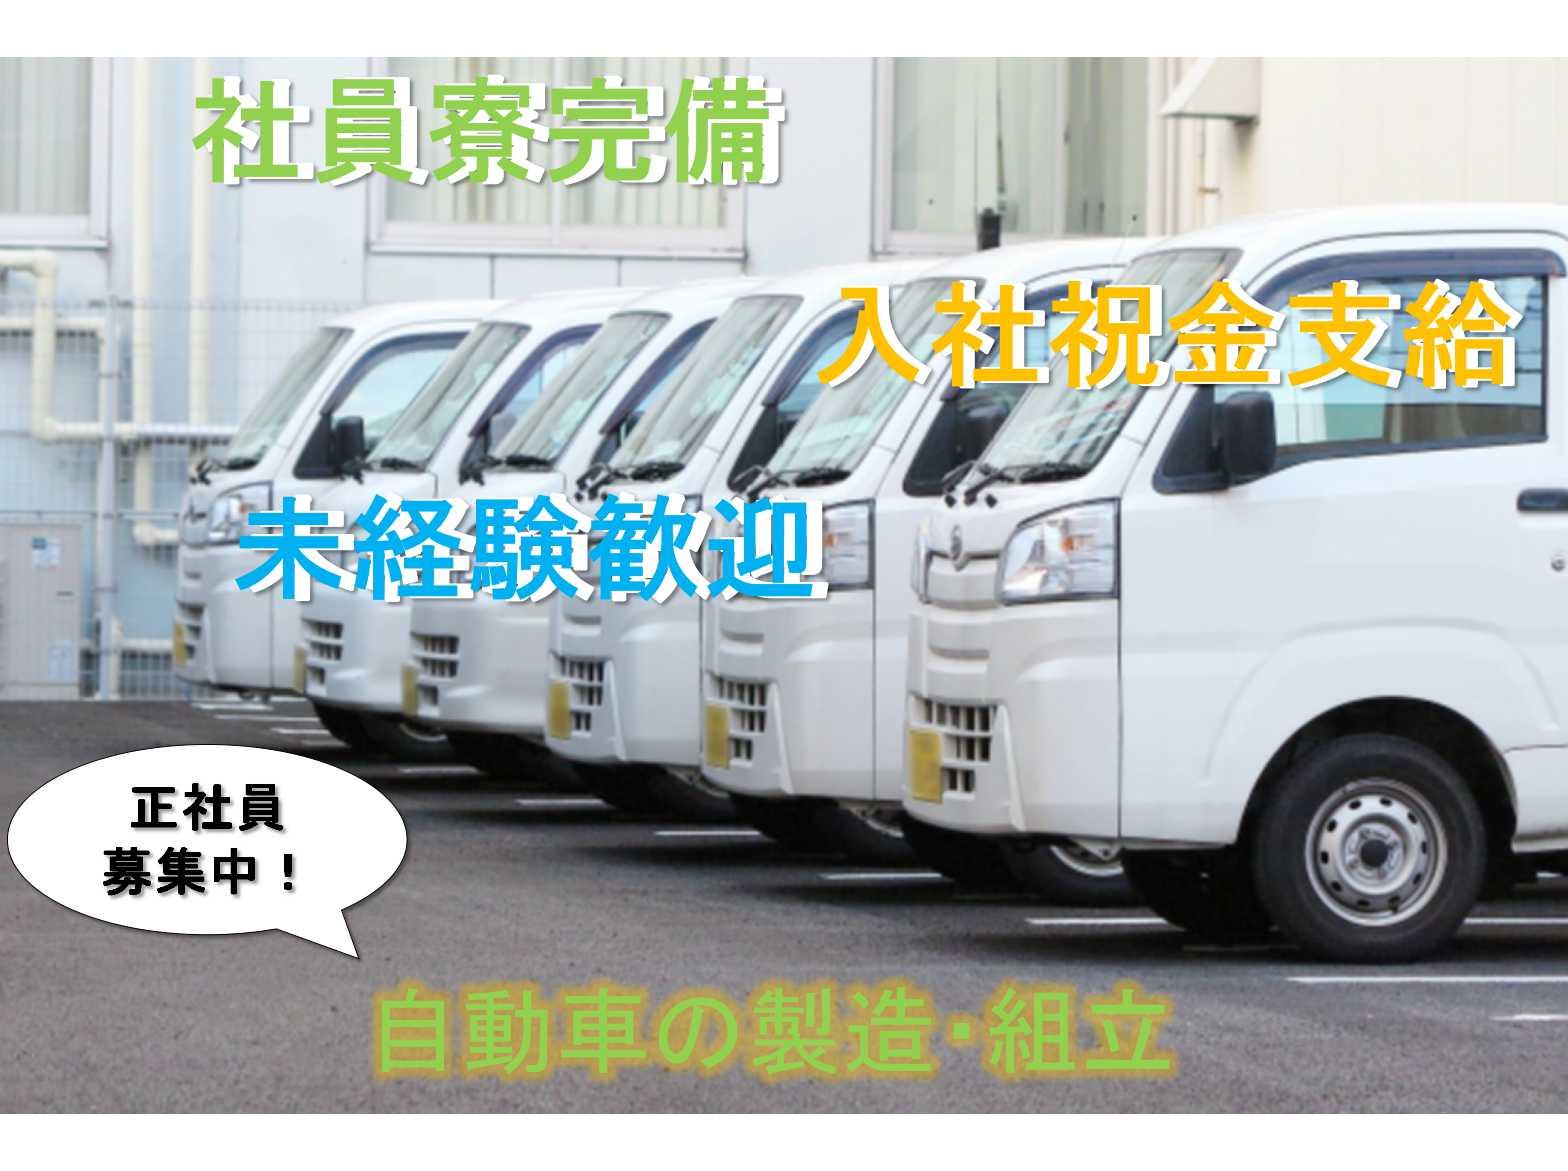 【正社員】入社祝金支給♪社員寮完備♪自動車の製造・組立 イメージ